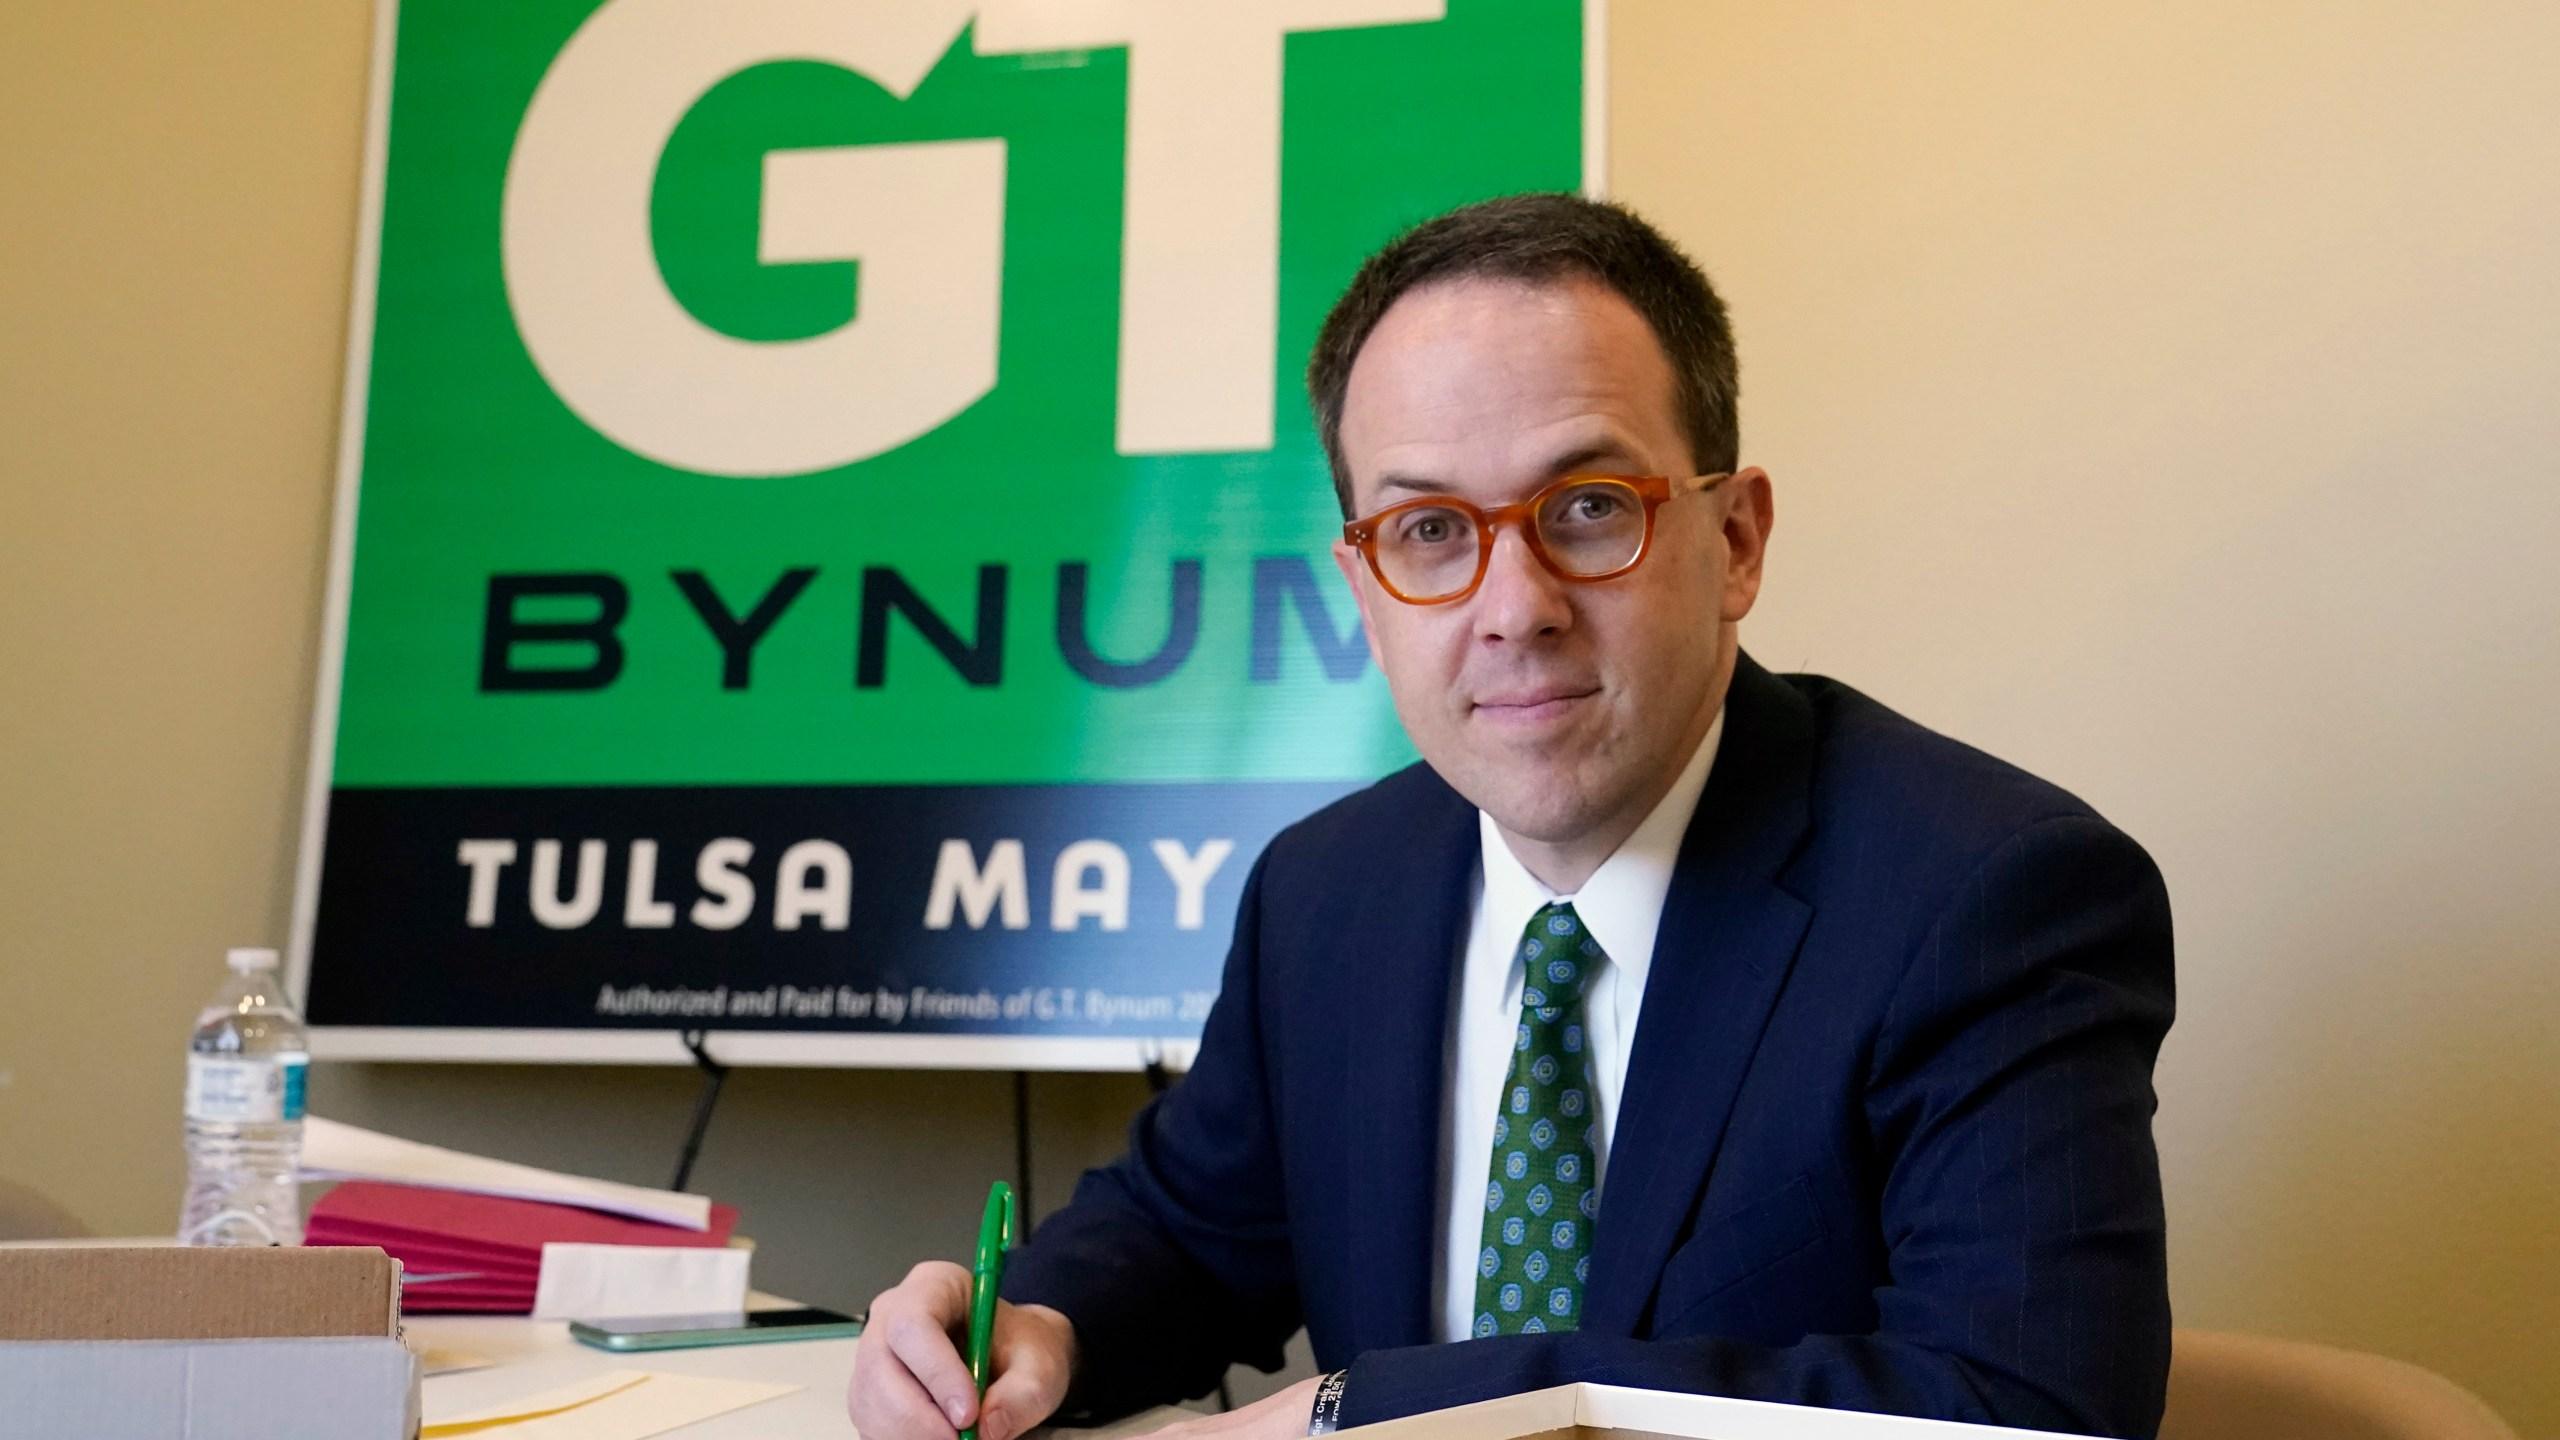 G.T. Bynum